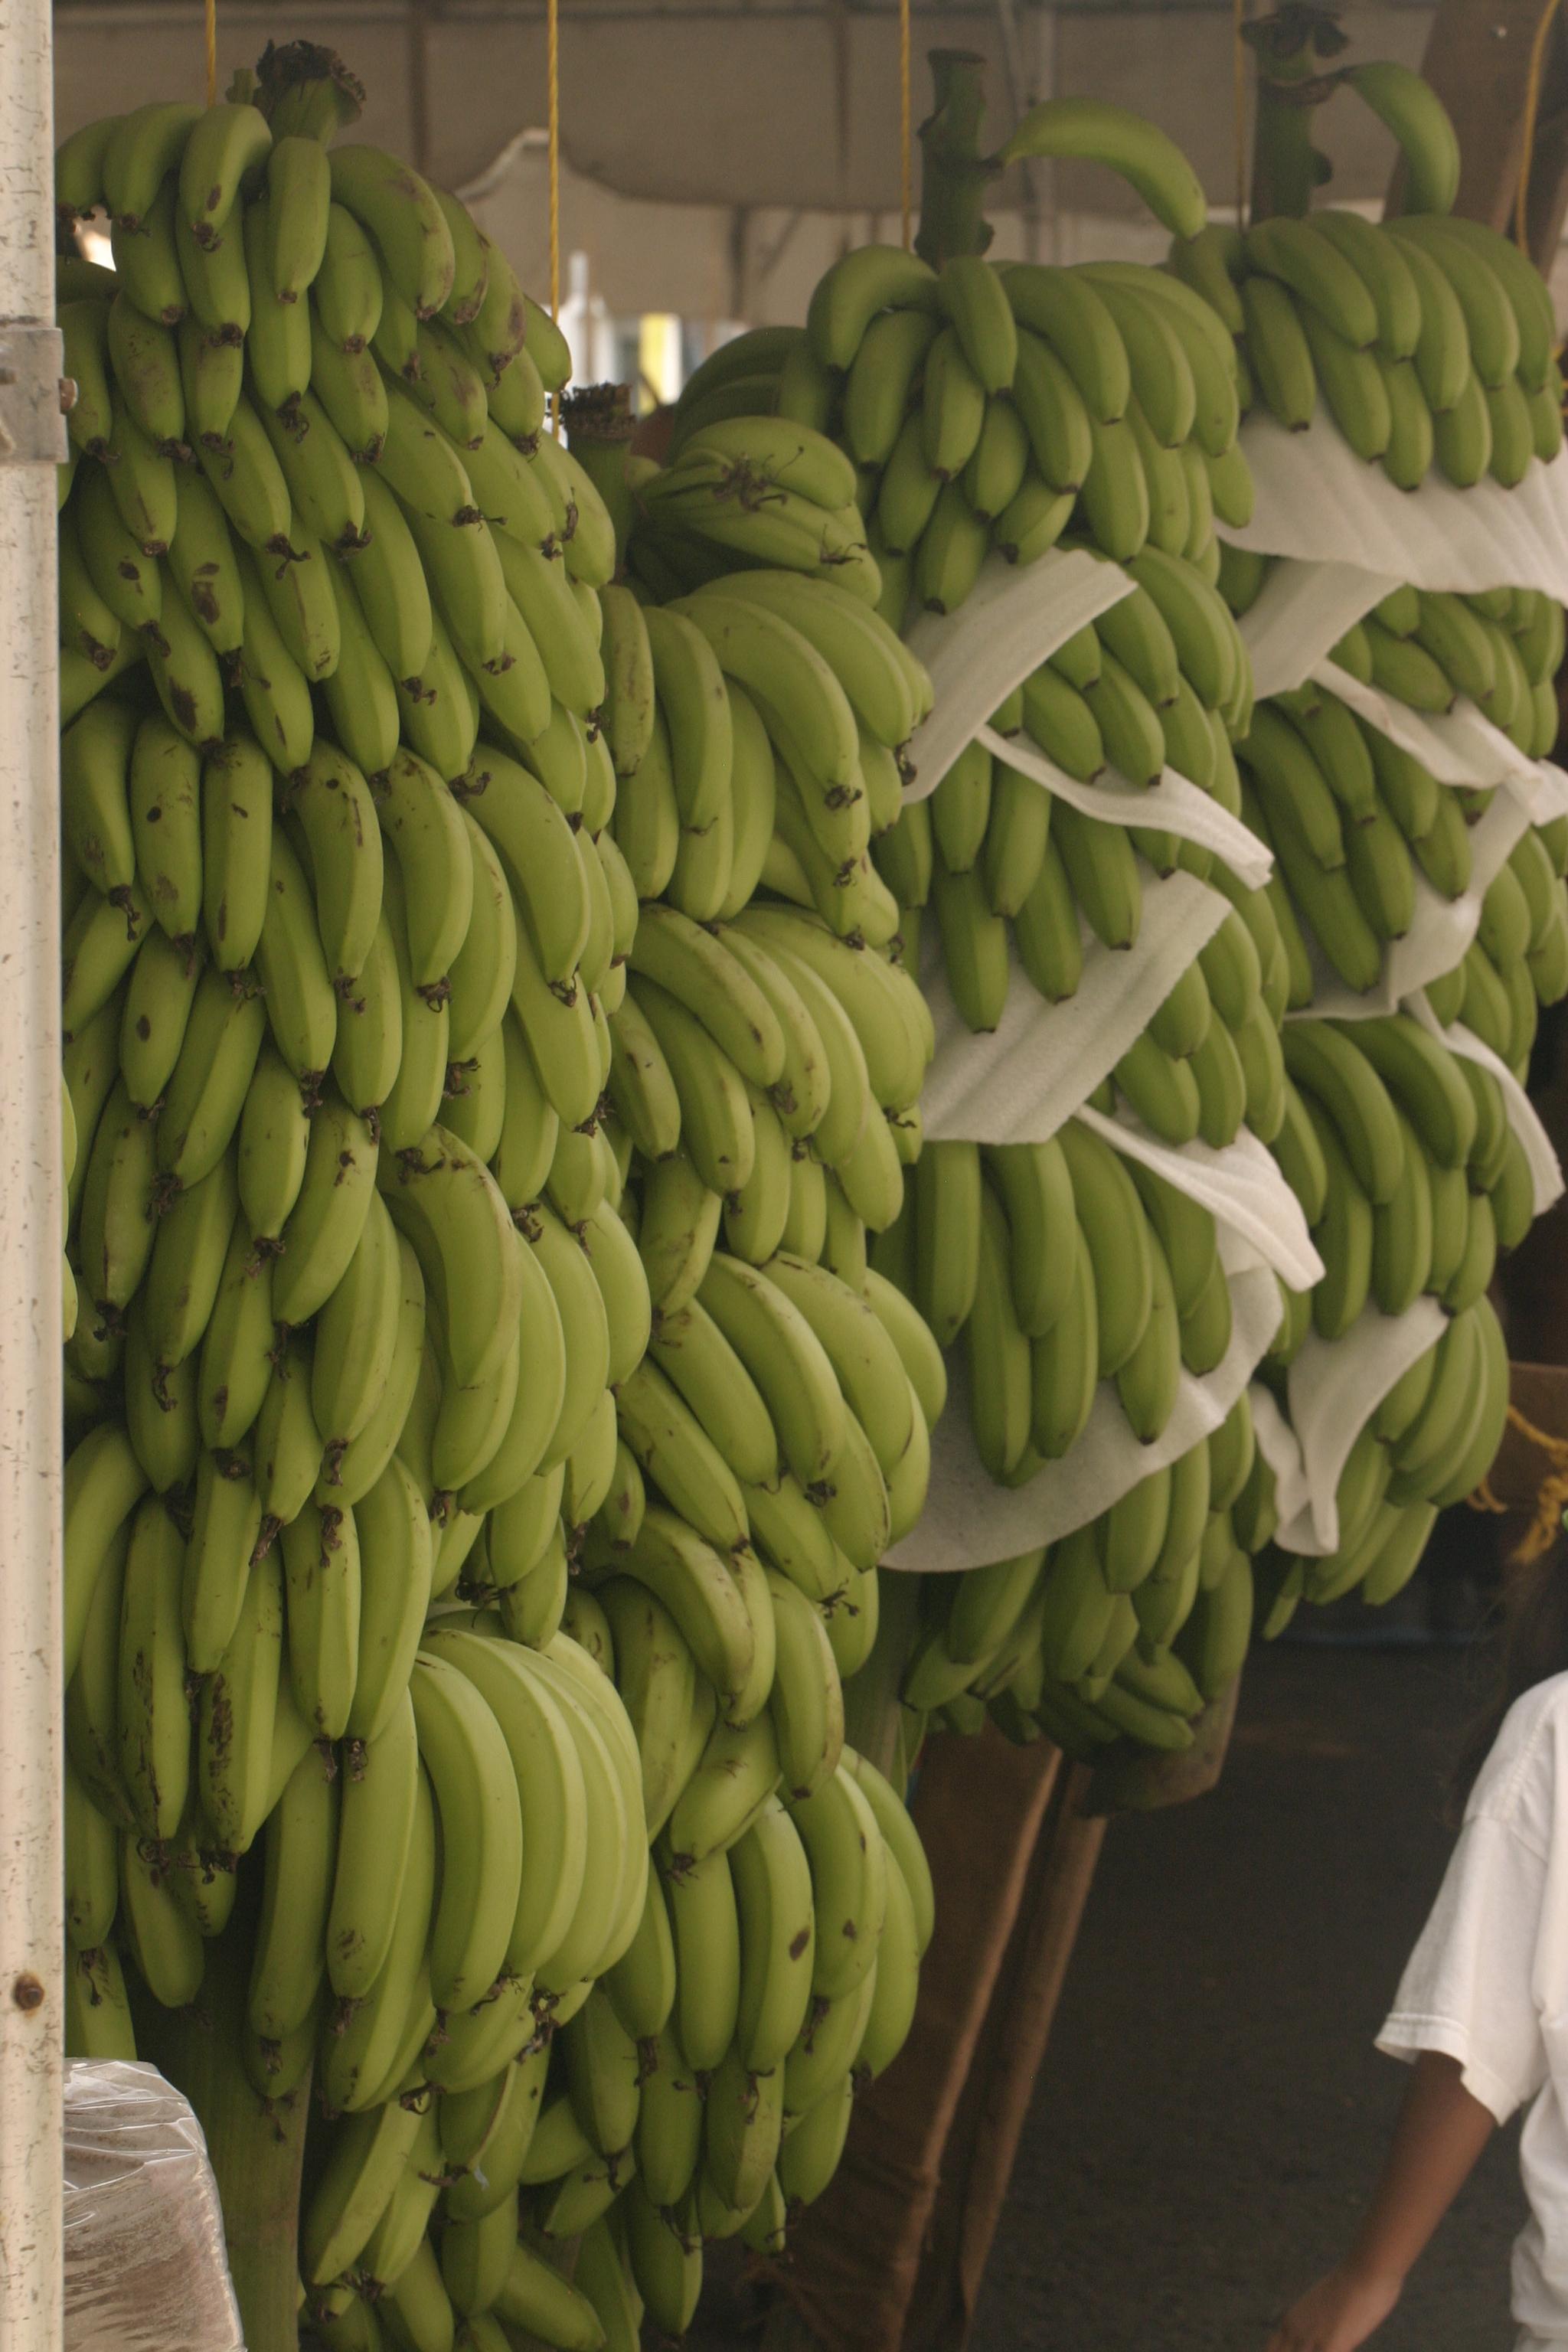 Cooking banana   Wikipedia